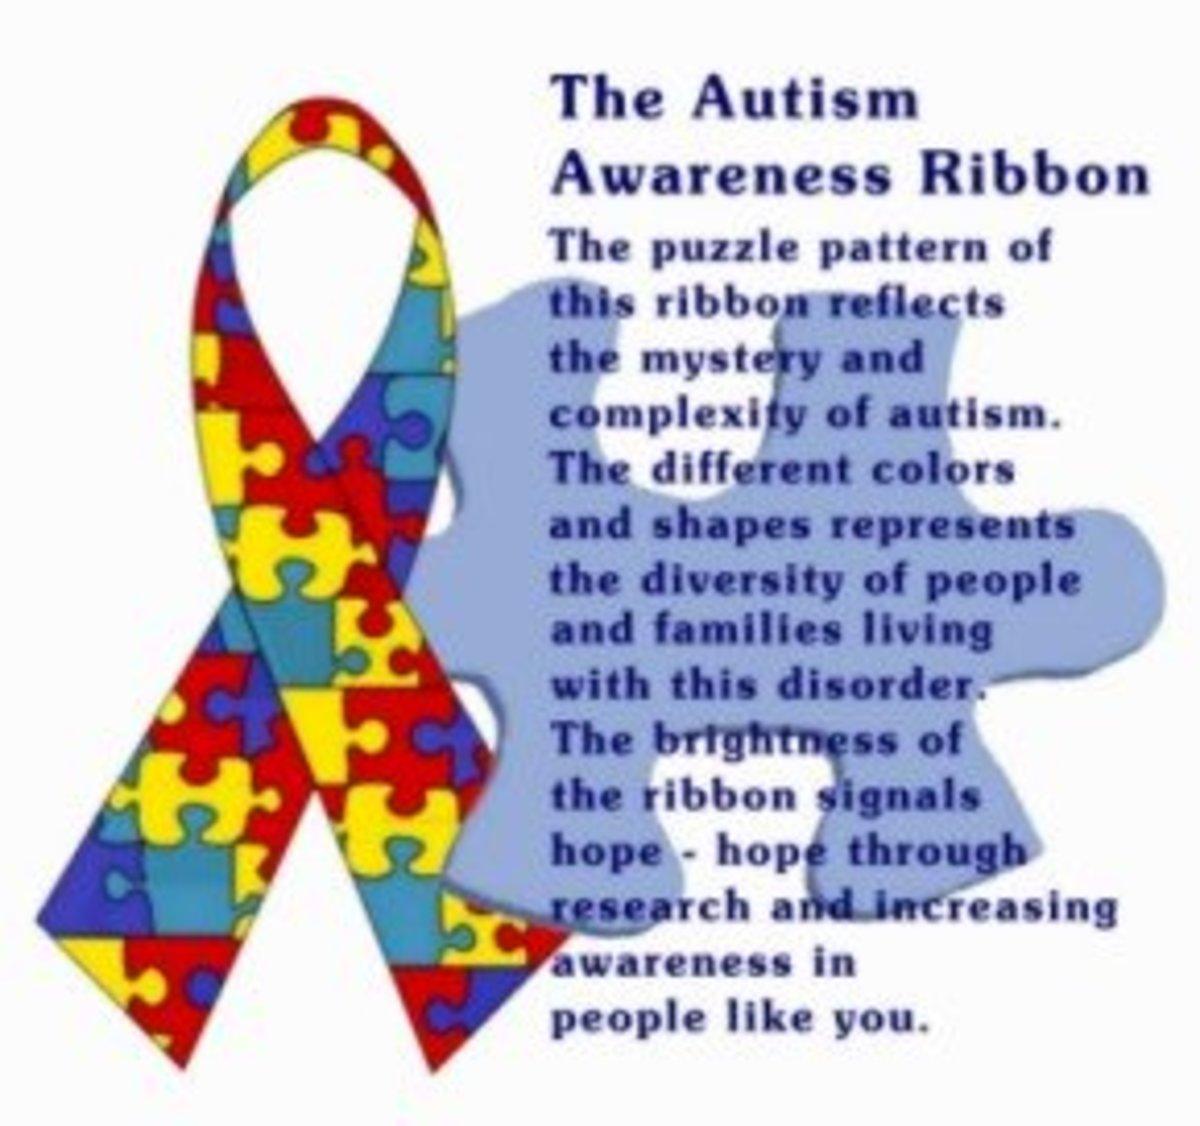 Ref: Autism Awareness